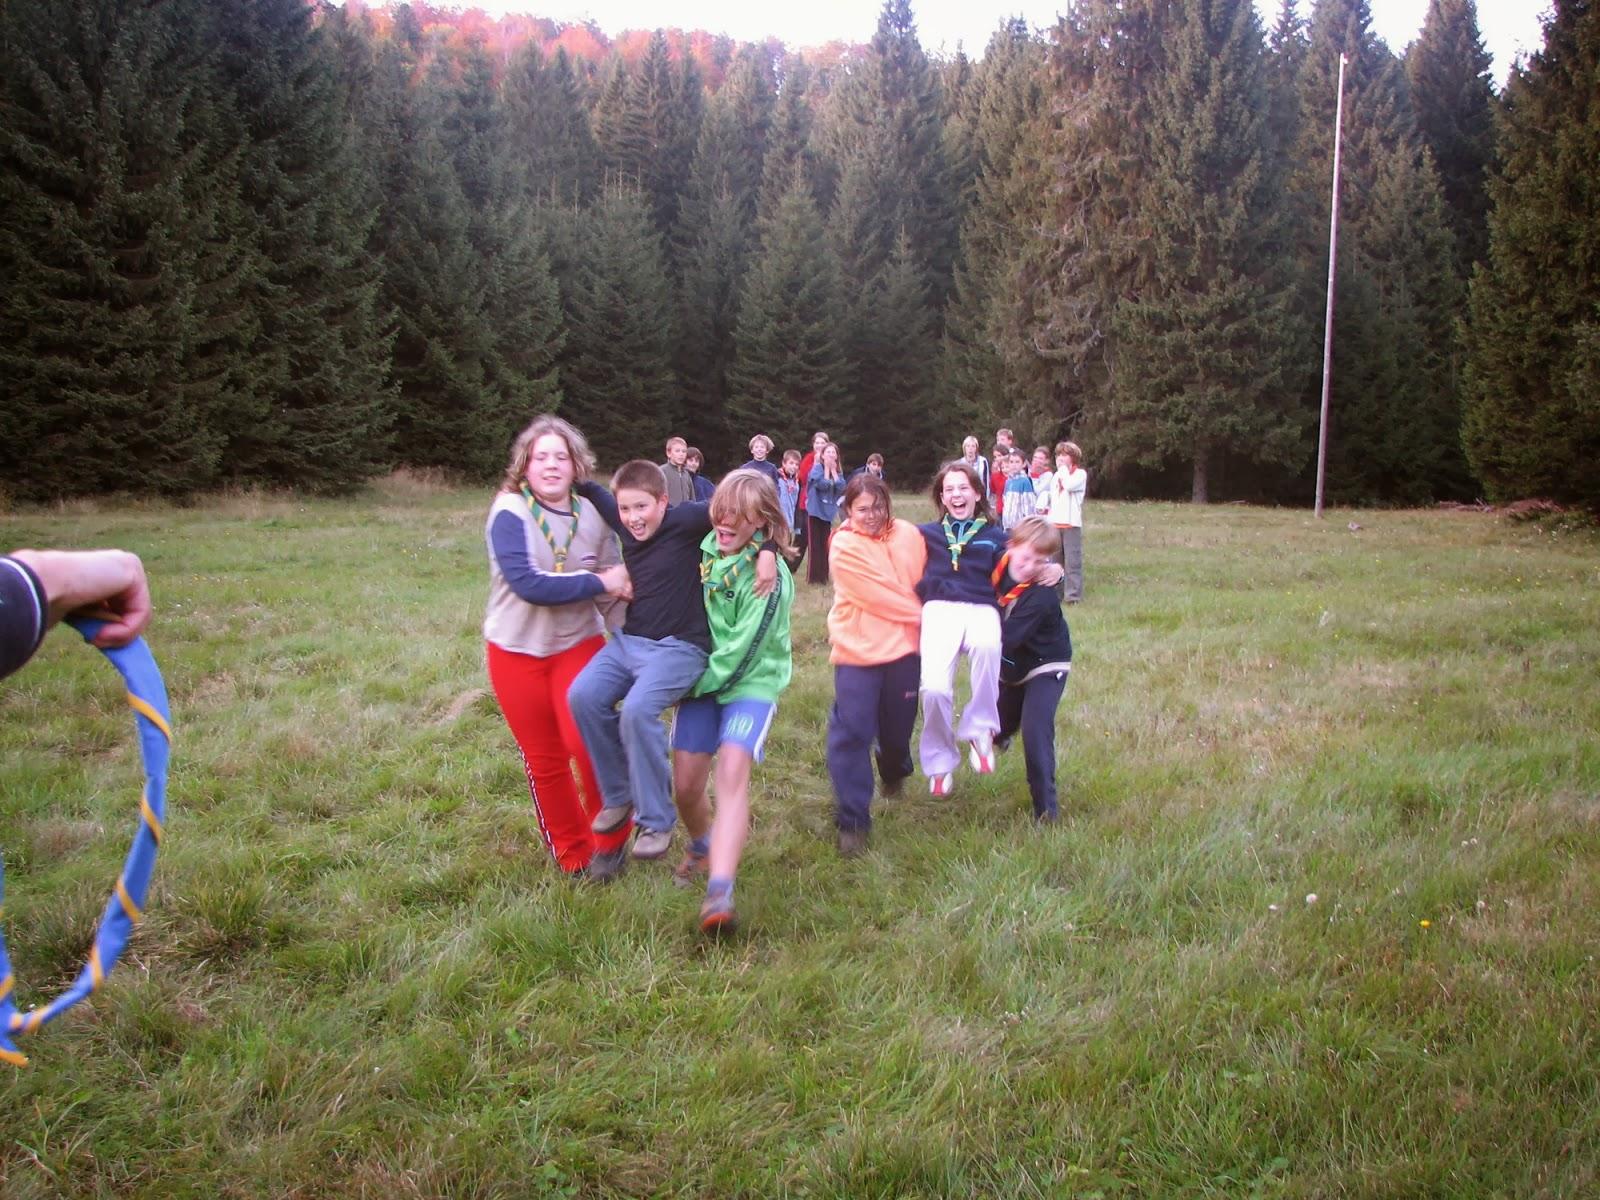 Vodov izlet, Ilirska Bistrica 2005 - Picture%2B242.jpg